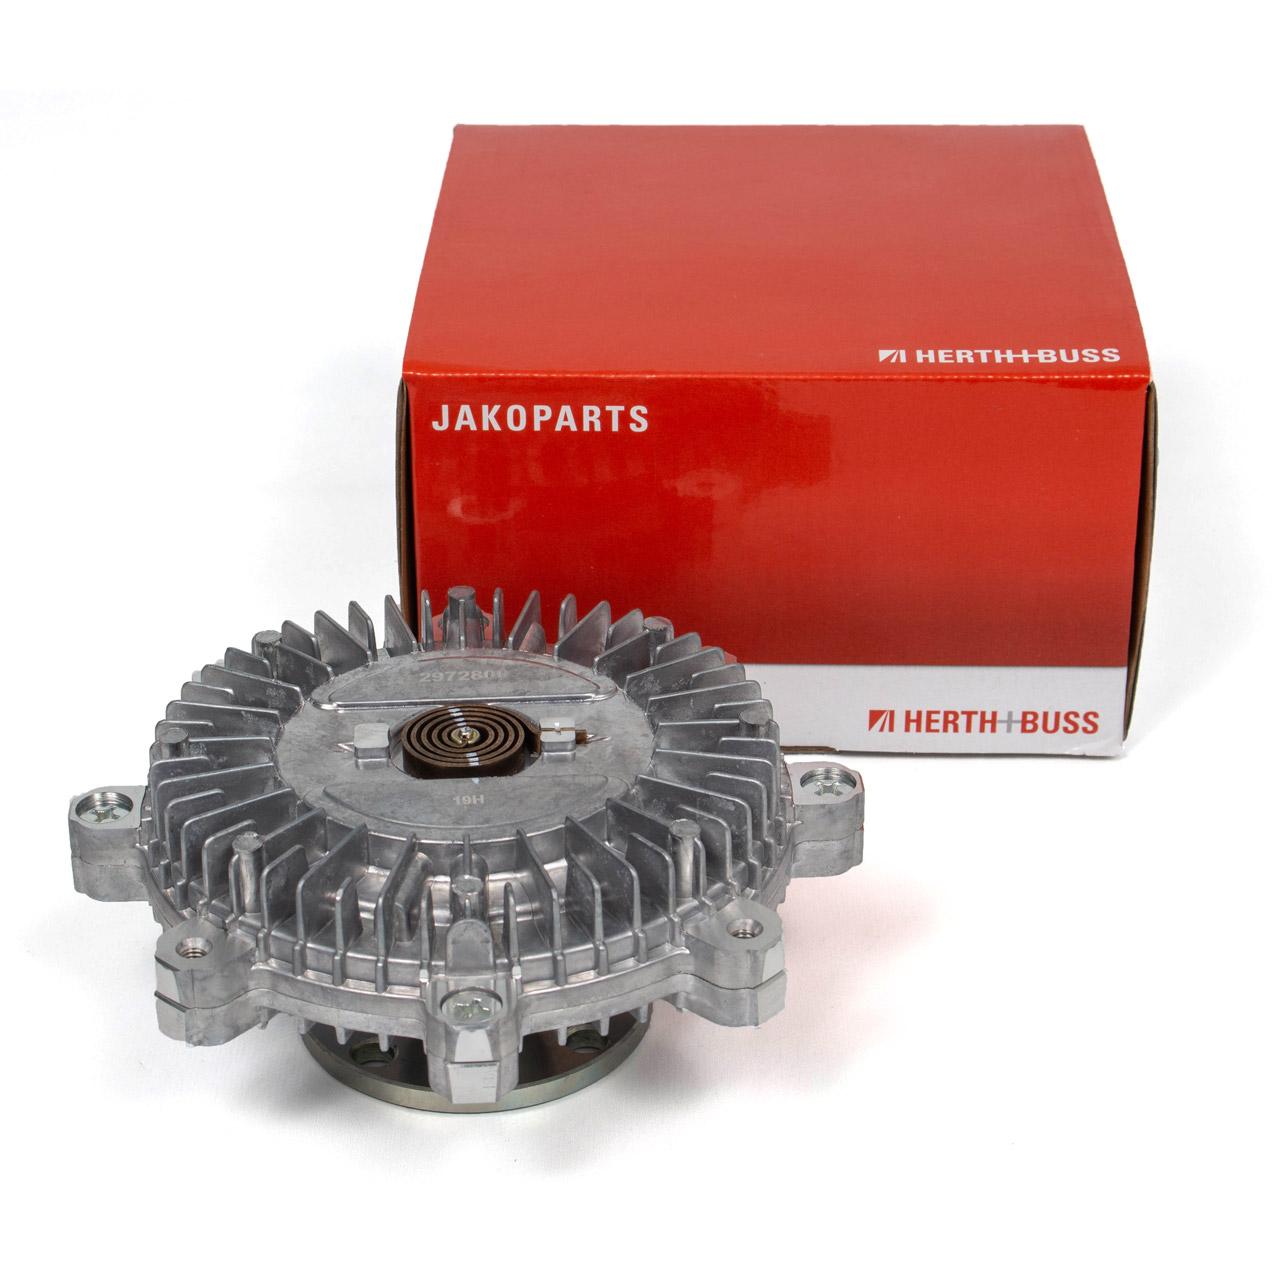 HERTH+BUSS JAKOPARTS Visko-Kupplung HYUNDAI Terracan HP 2.9 CRDi 4WD